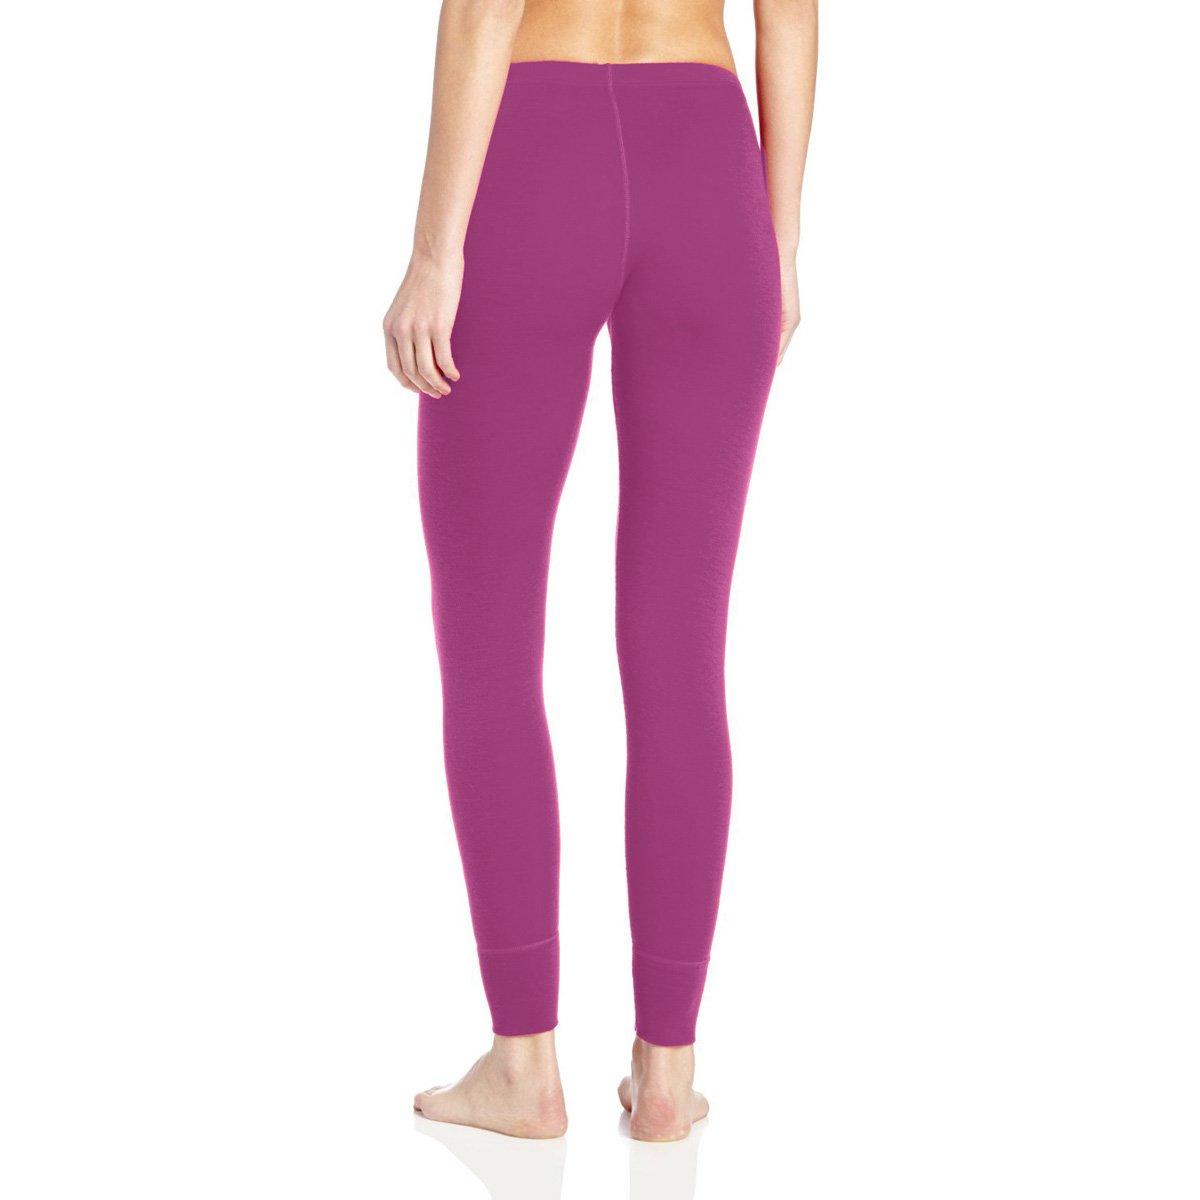 Minus33 Merino Wool Clothing 803 Women's Franconia Midweight Wool Bottom, Radiant Violet, Medium by Minus33 Merino Wool (Image #3)